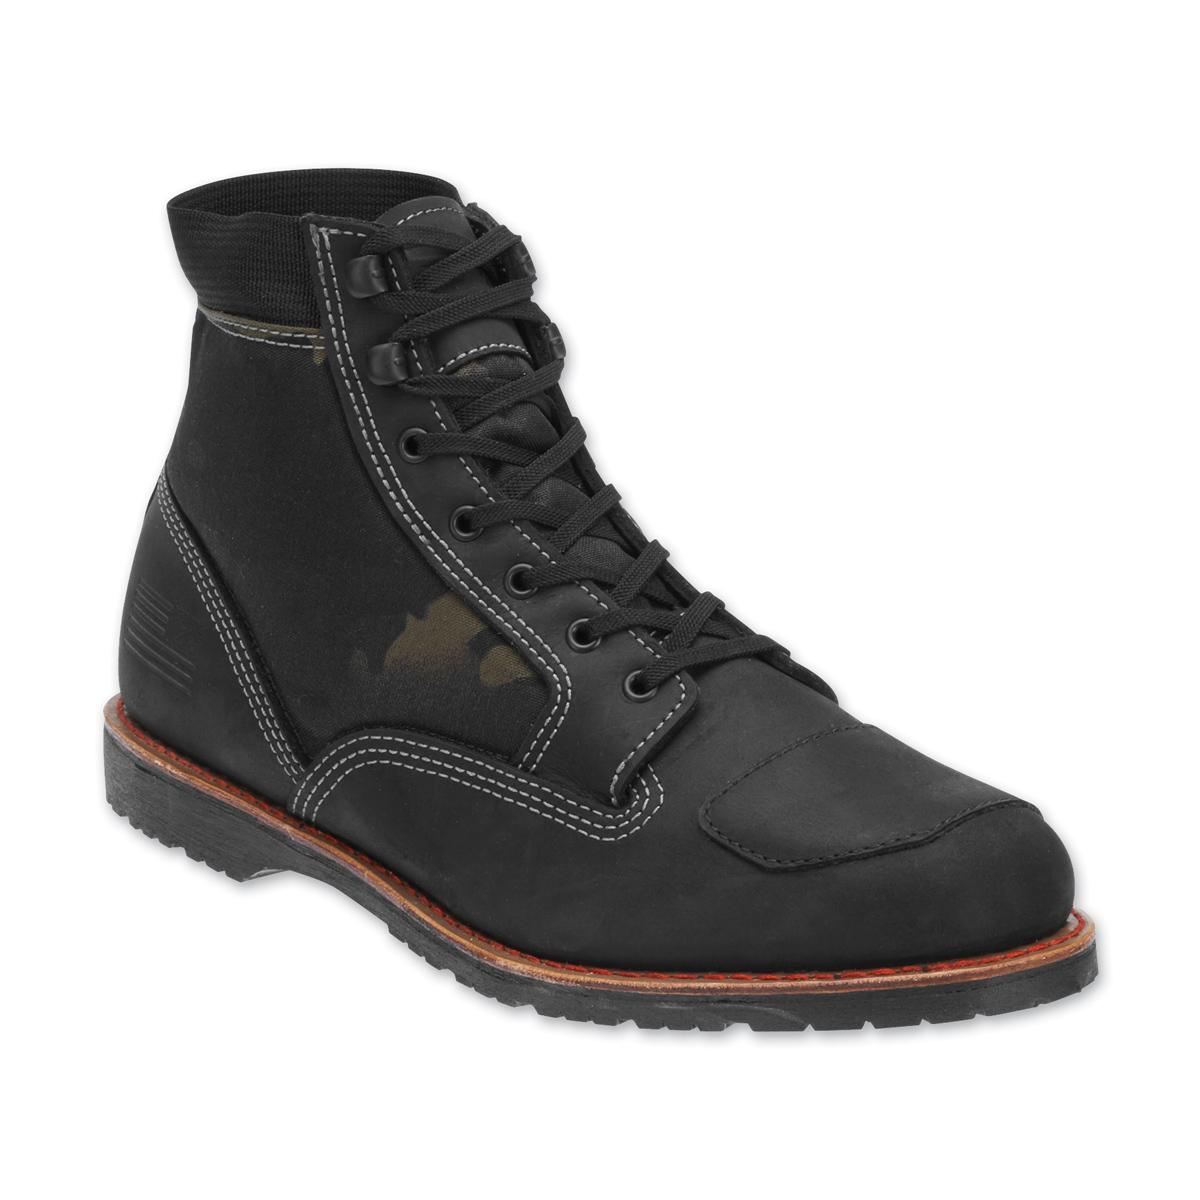 Bates Men's Freedom Black/Camo Leather Boots